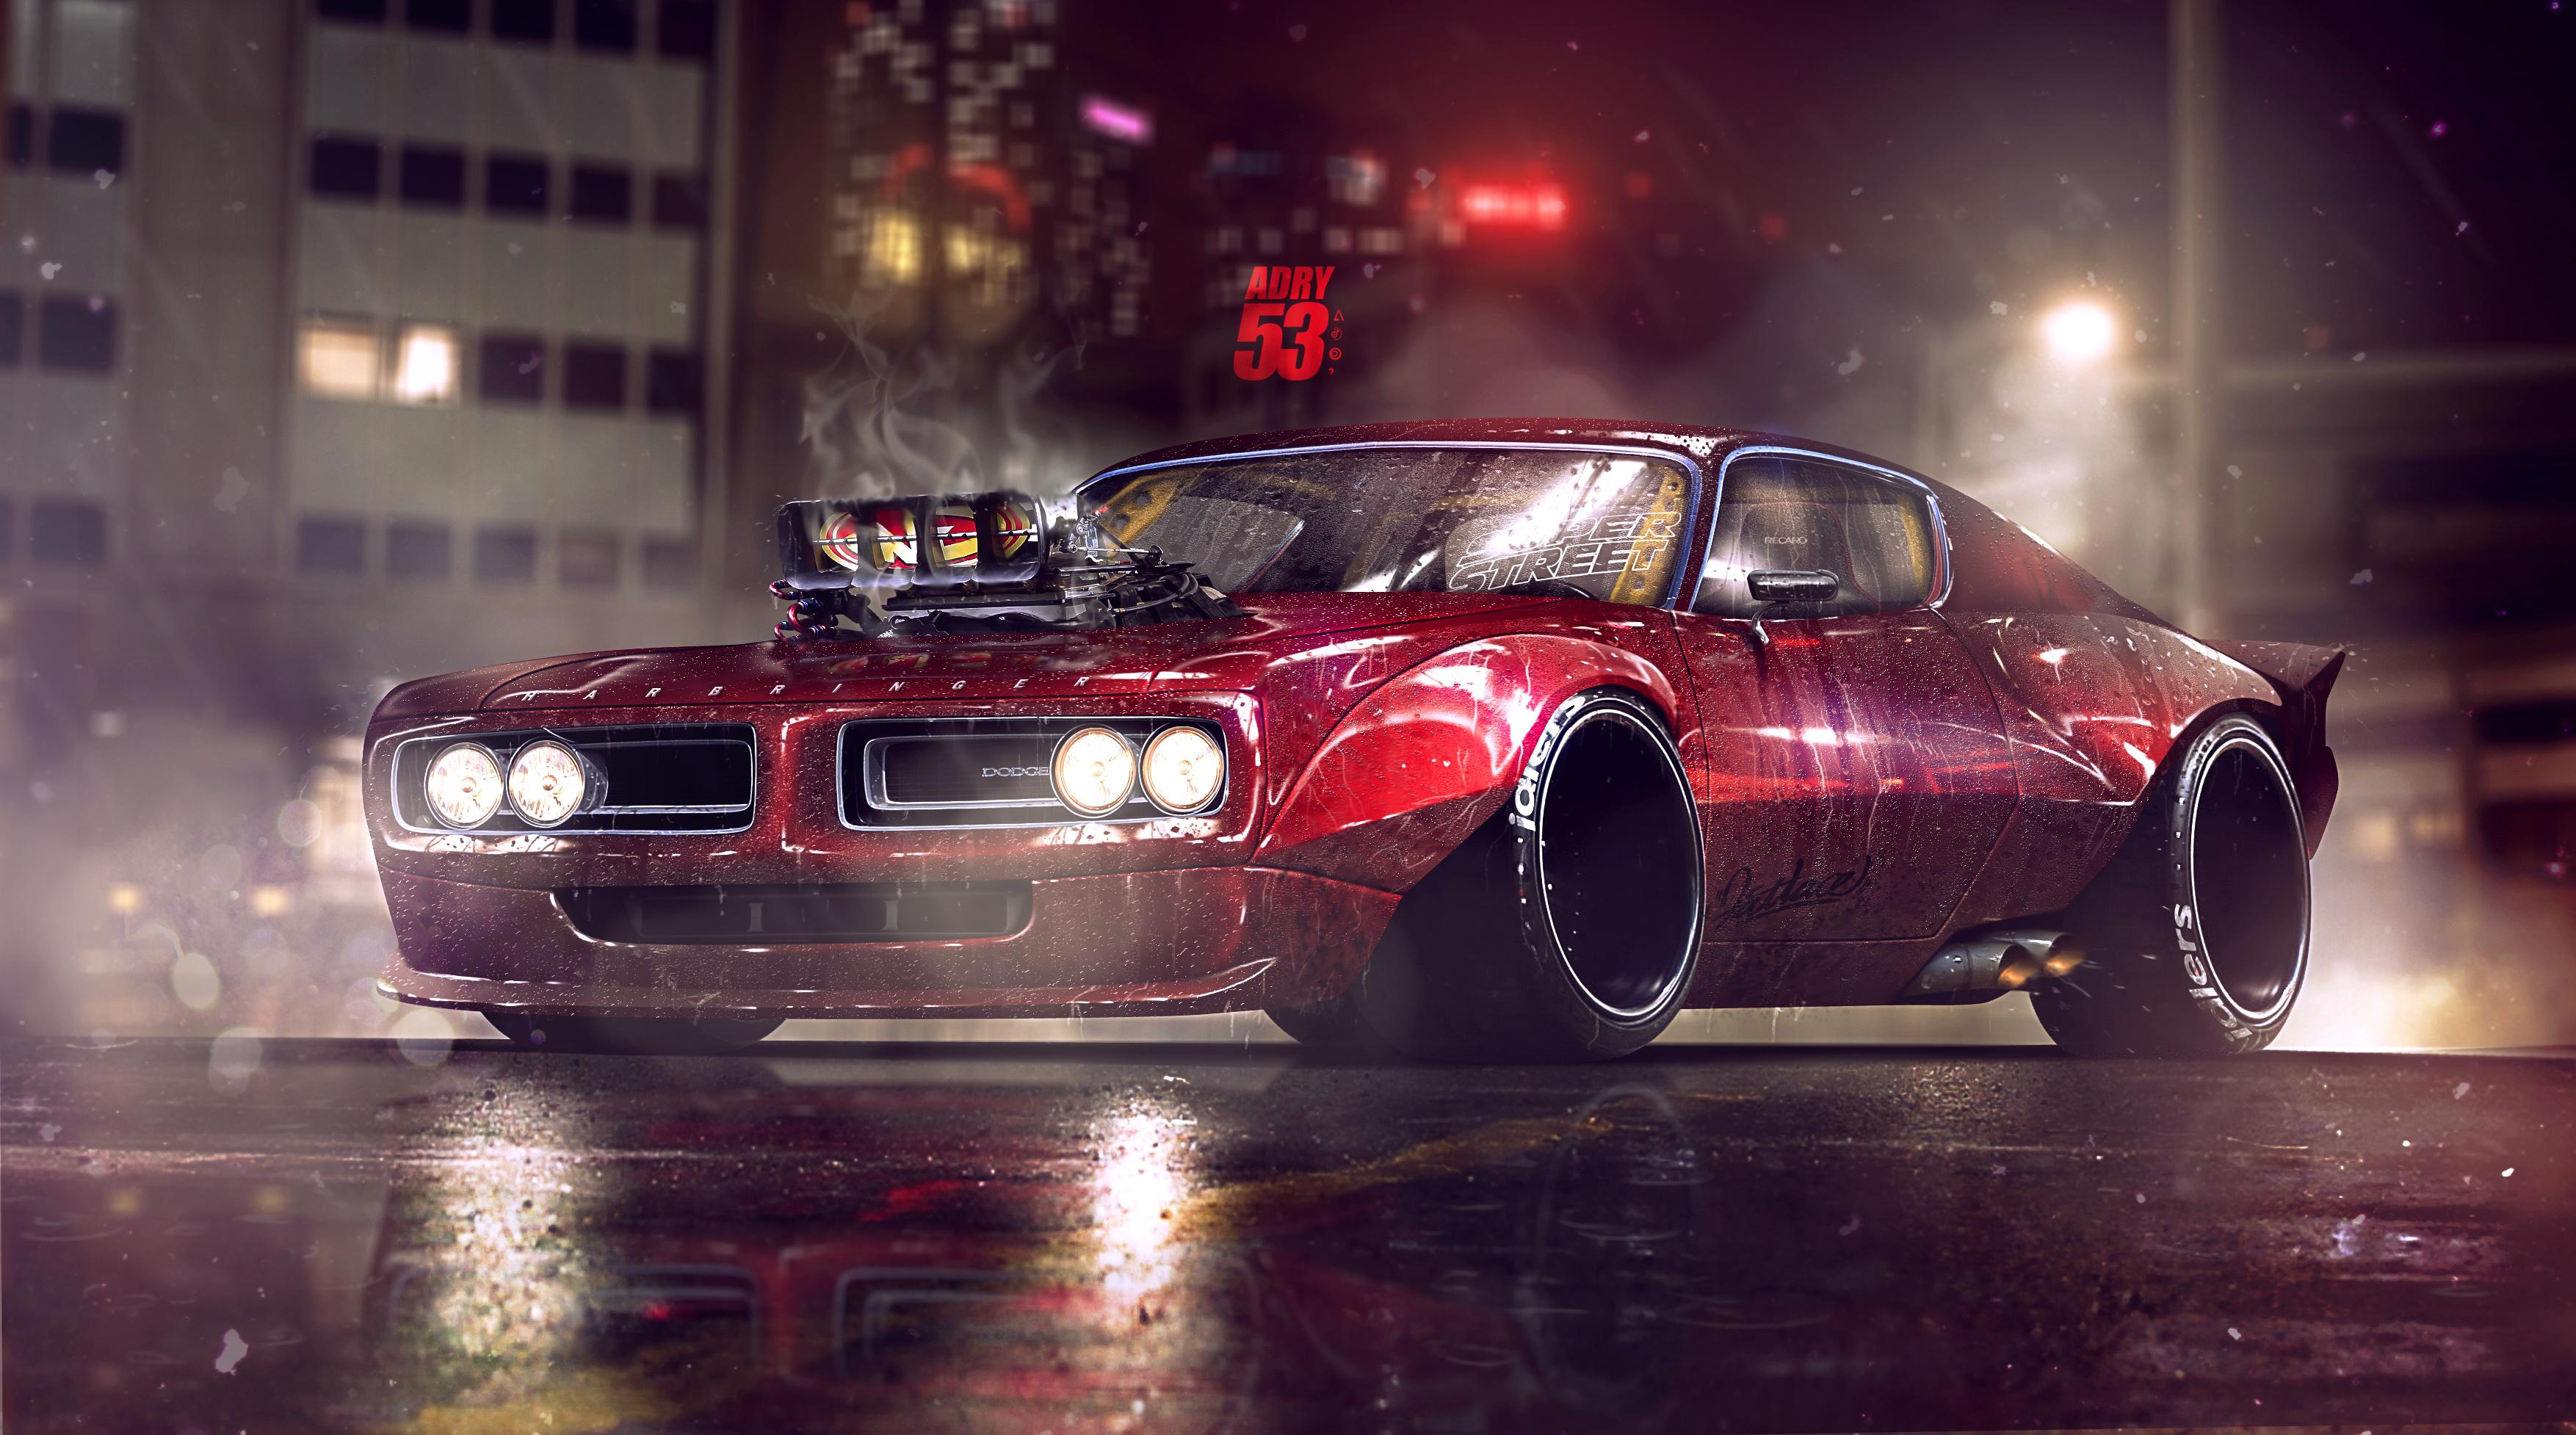 Dodge Charger Artwork 4k Hd Cars 4k Wallpapers Images